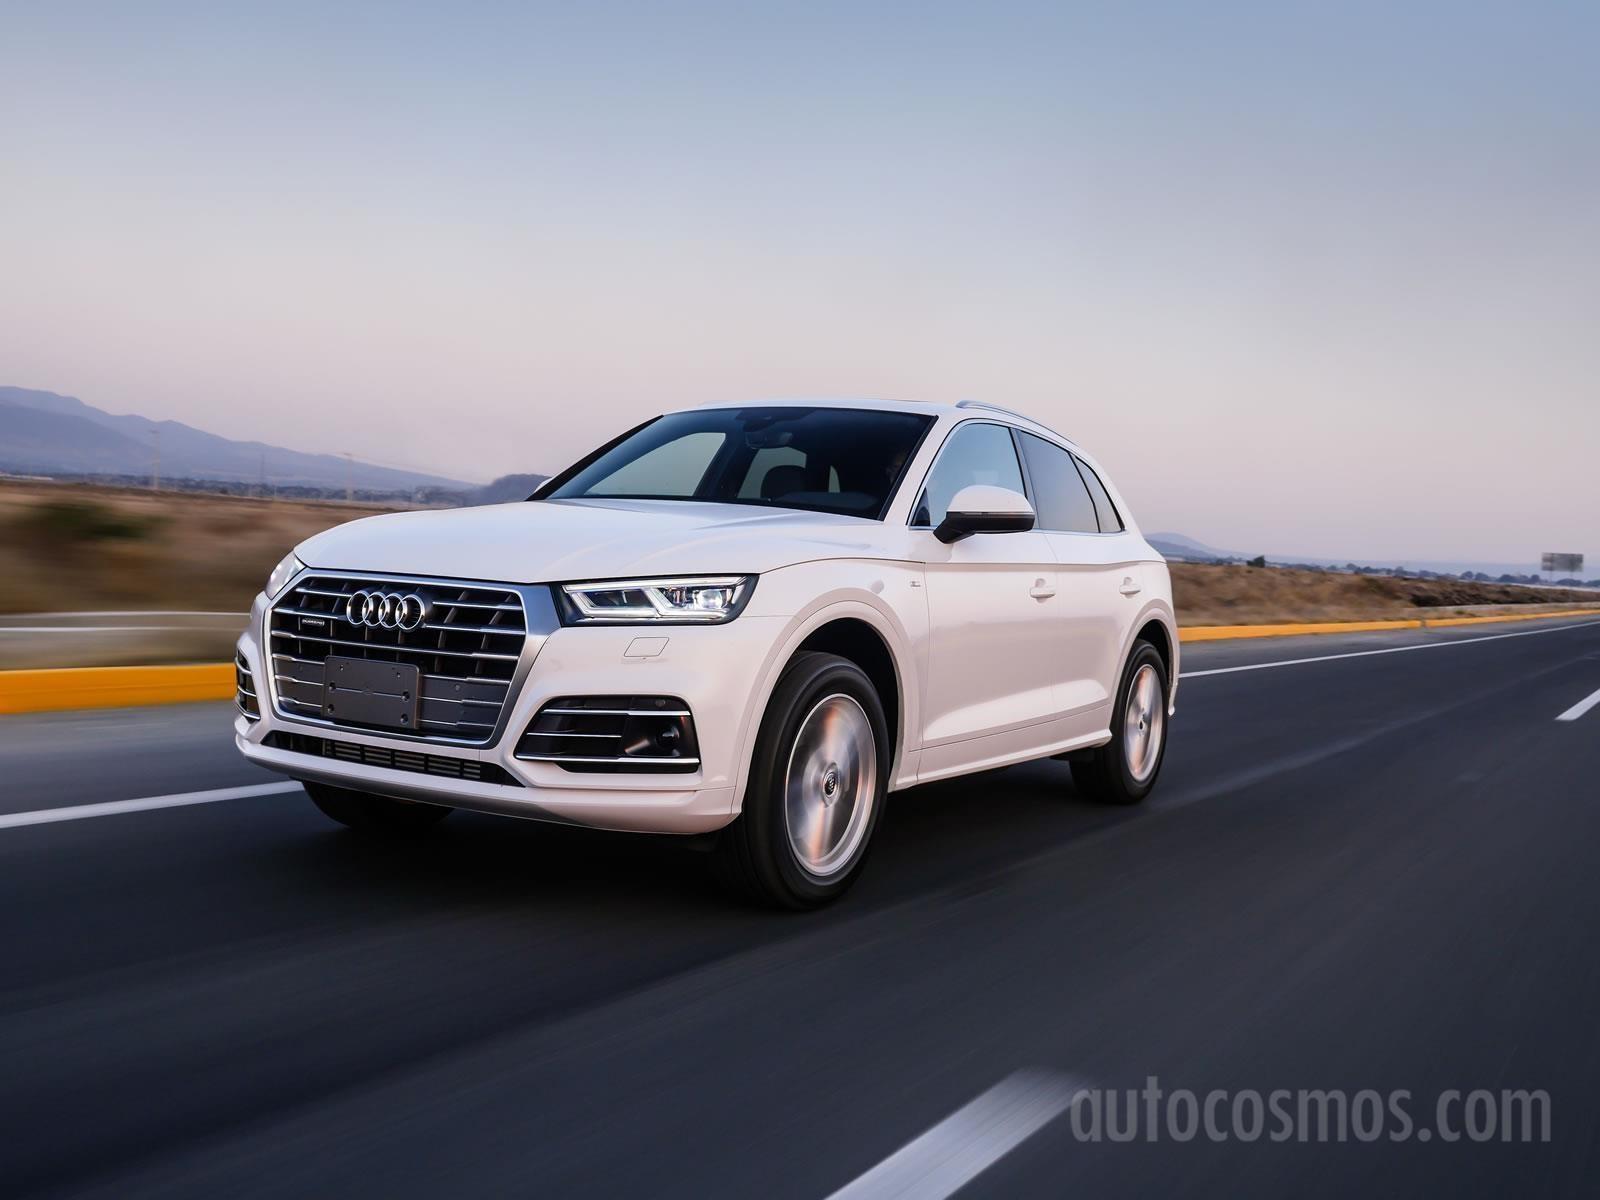 Manejamos la Audi Q5 2018 - Autocosmos.com